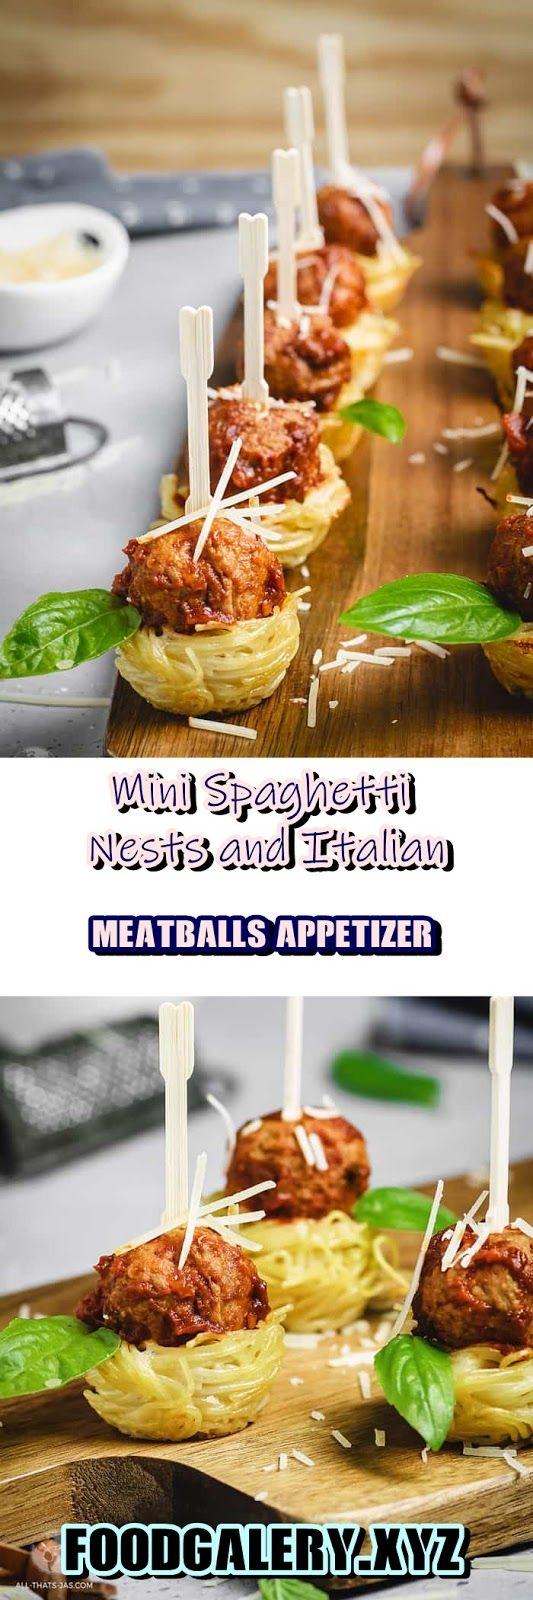 MINI SPAGHETTI NESTS AND ITALIAN MEATBALLS APPETIZER